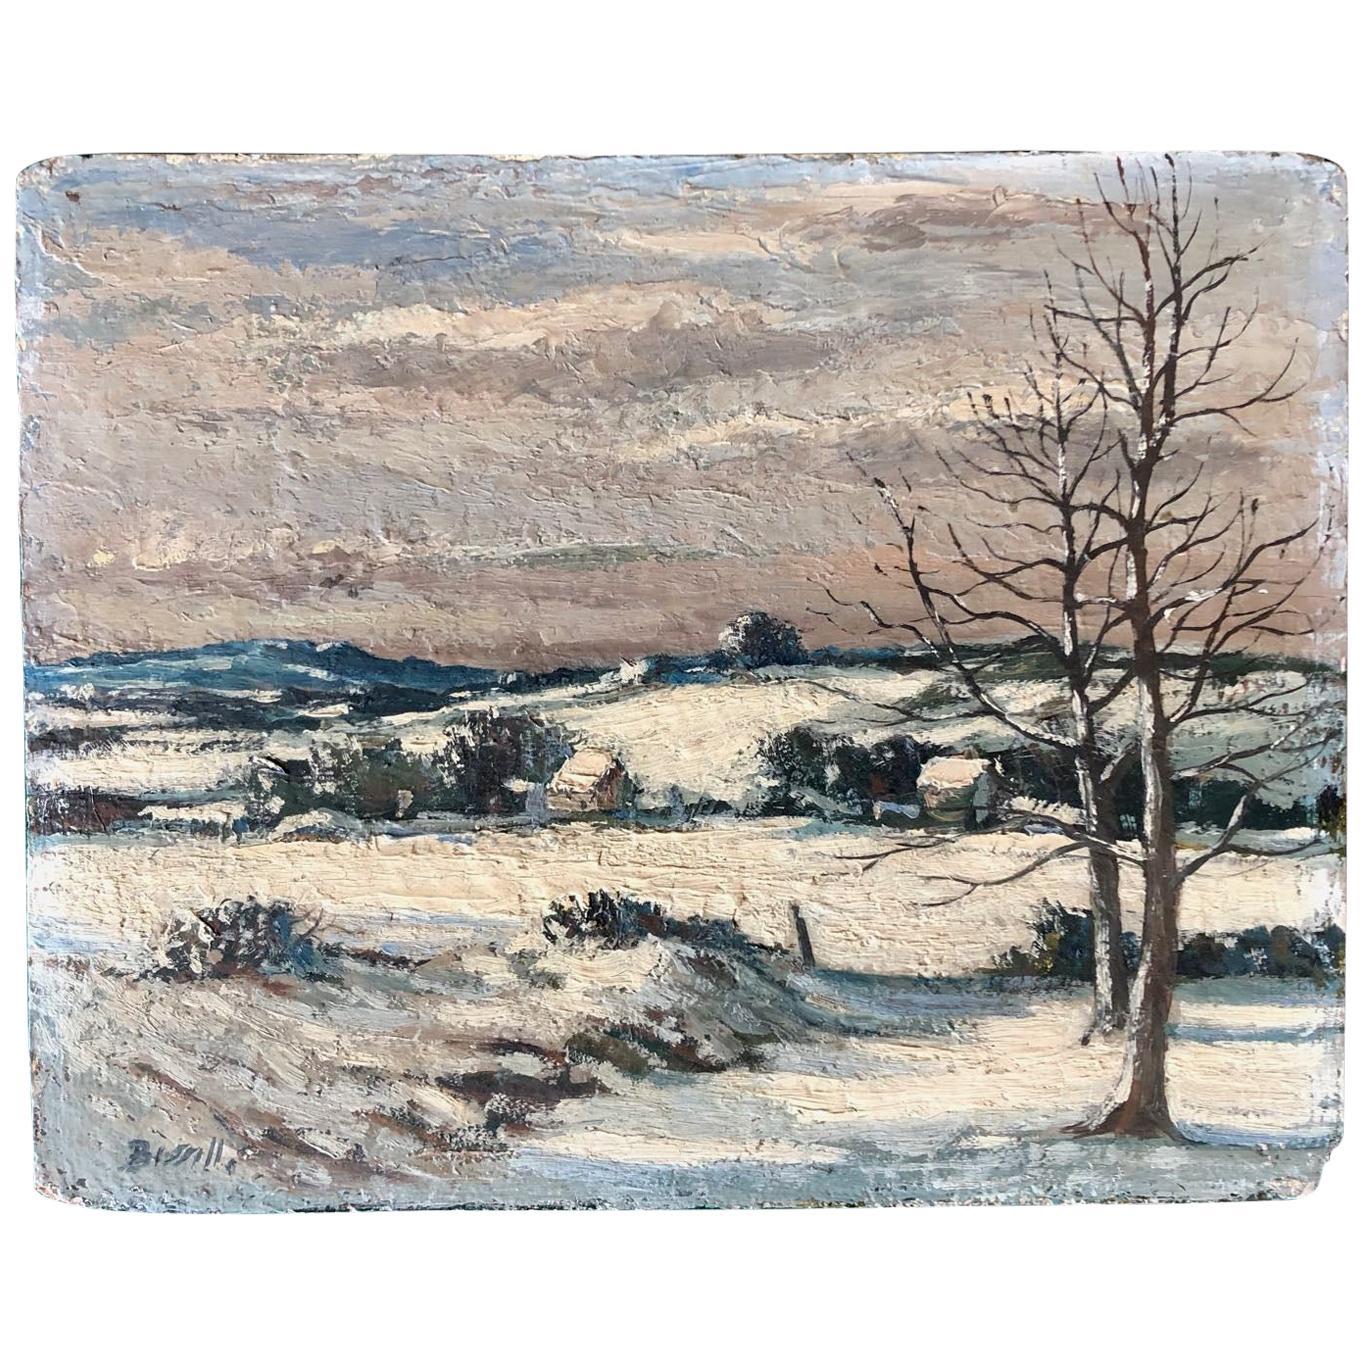 George William Bissill (1896-1973), British, Oil Painting , Winter Landscape